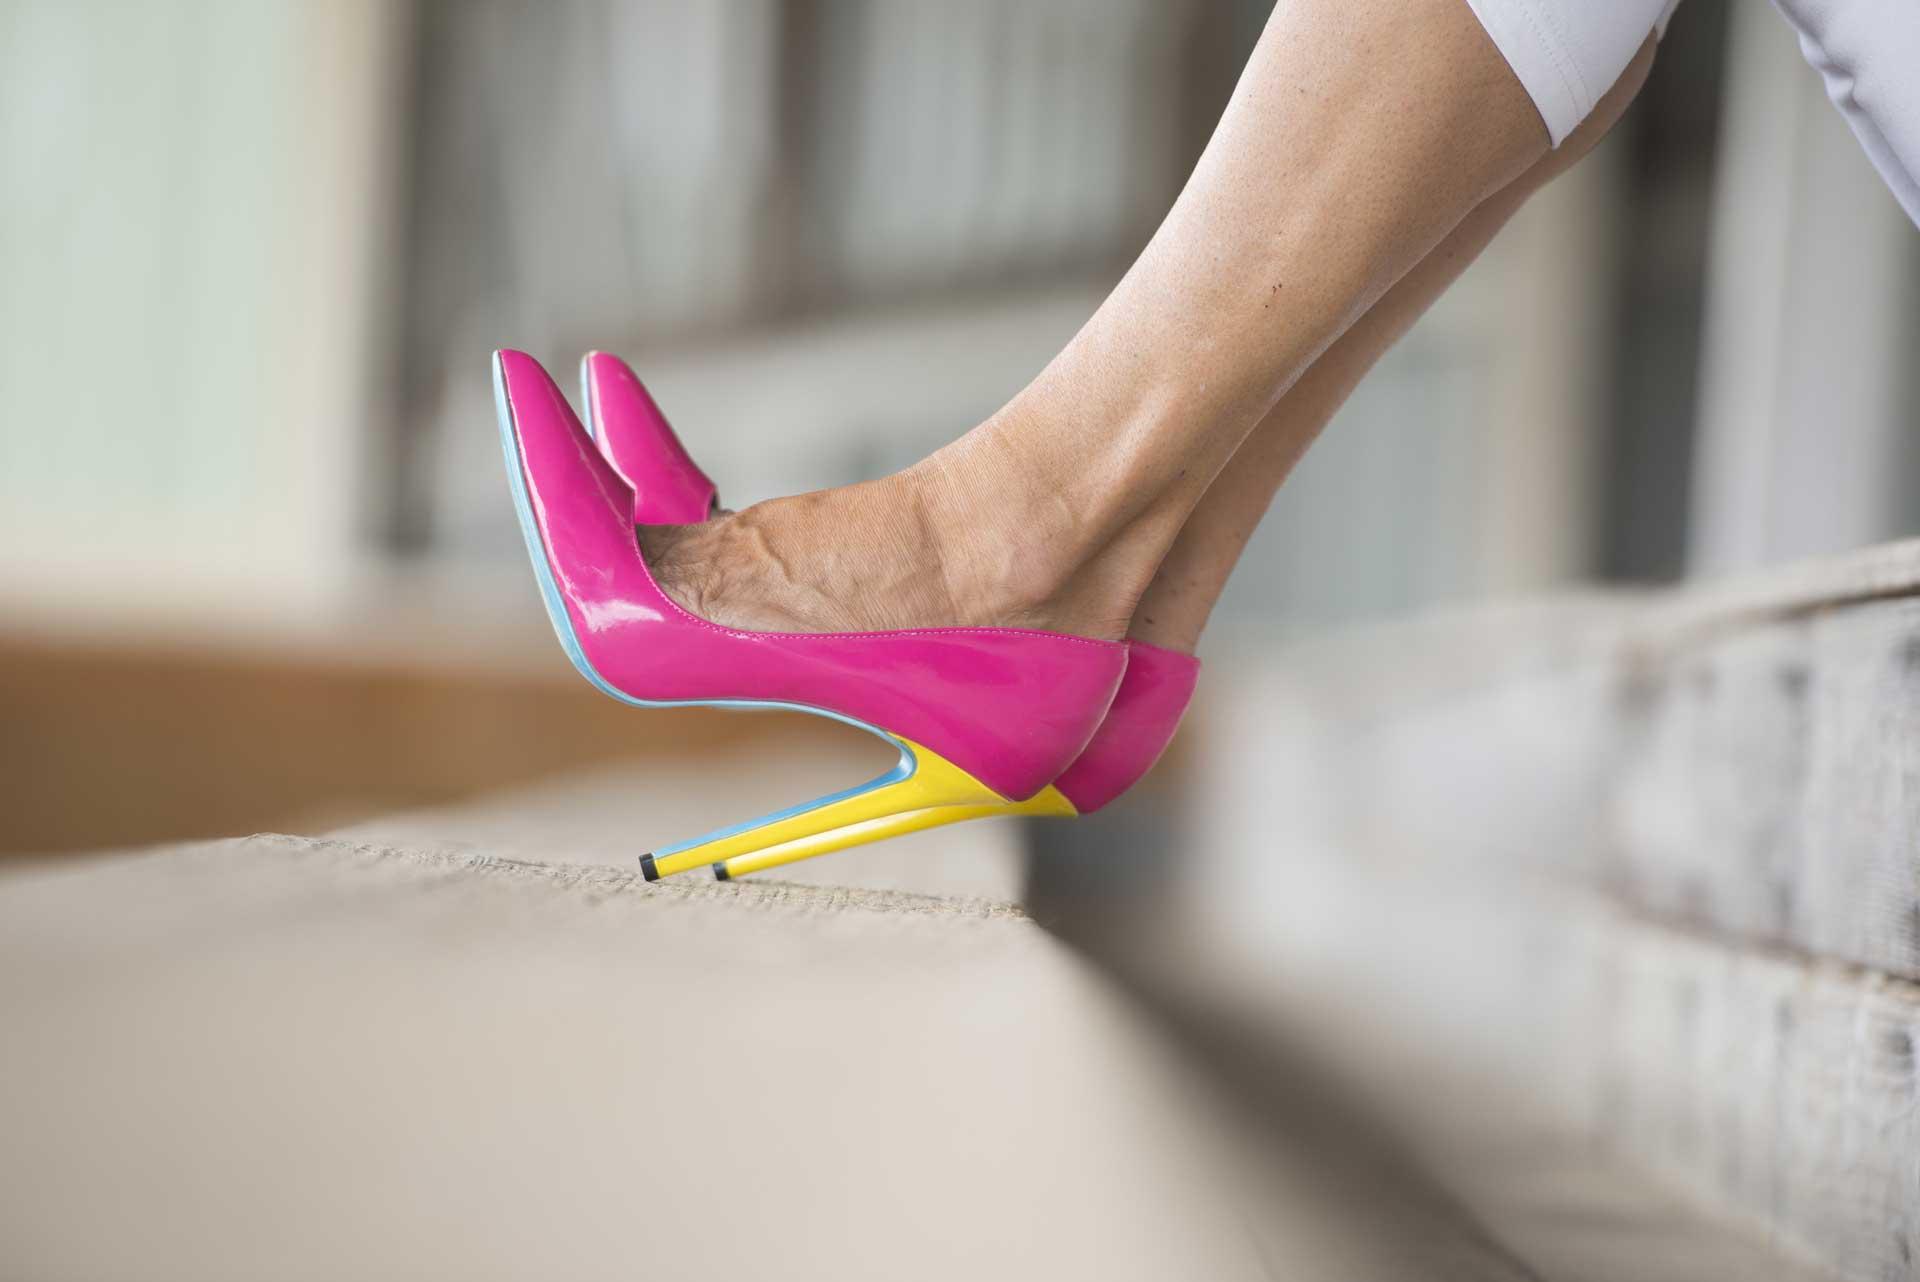 5 reason not to wear high heels image of vivid colored heels